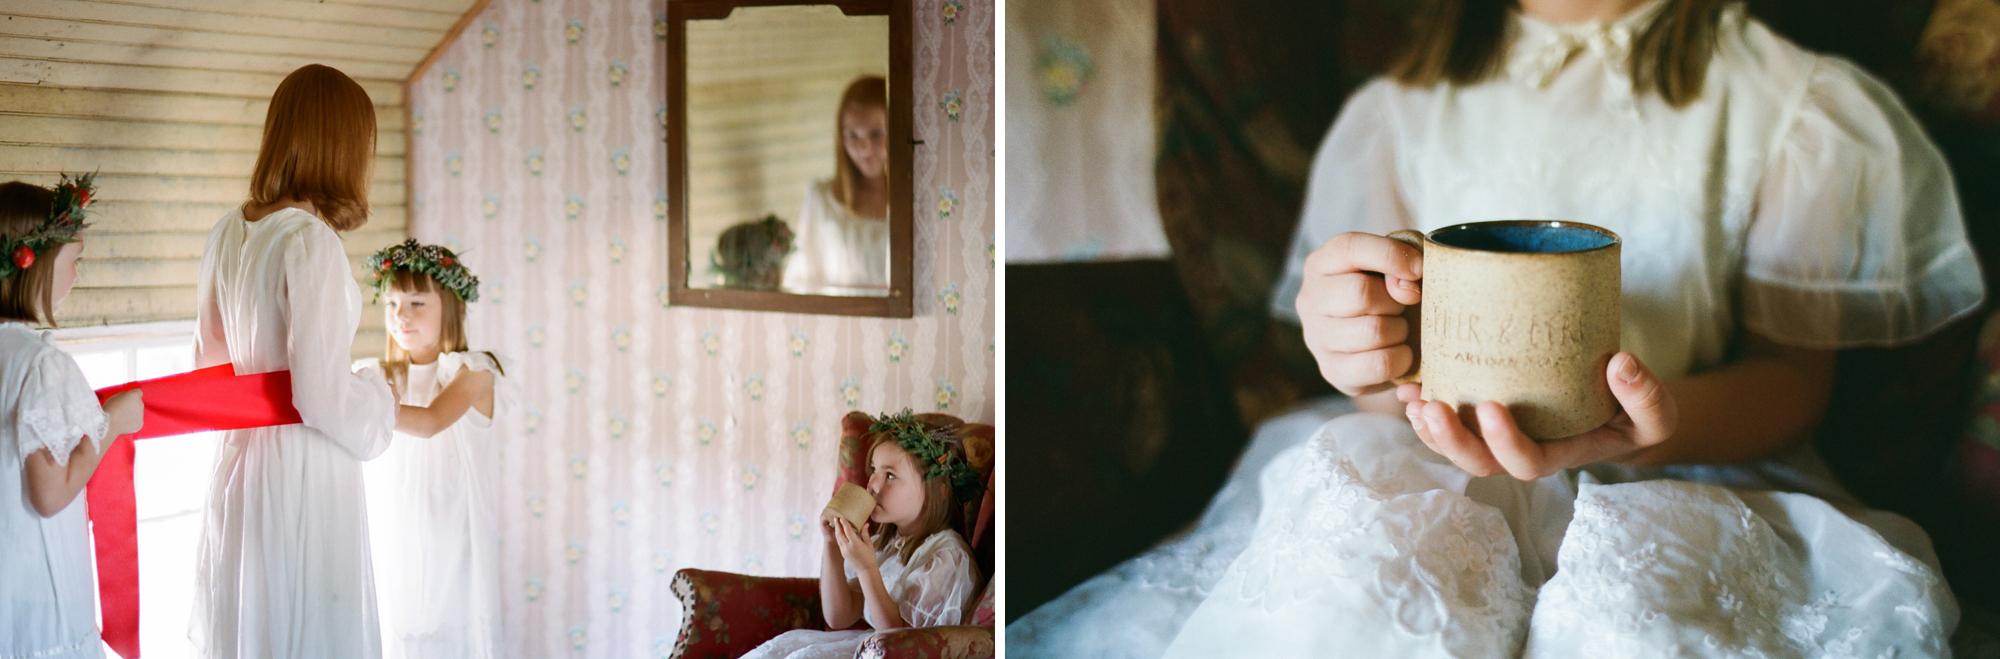 editorial-photographer_0006